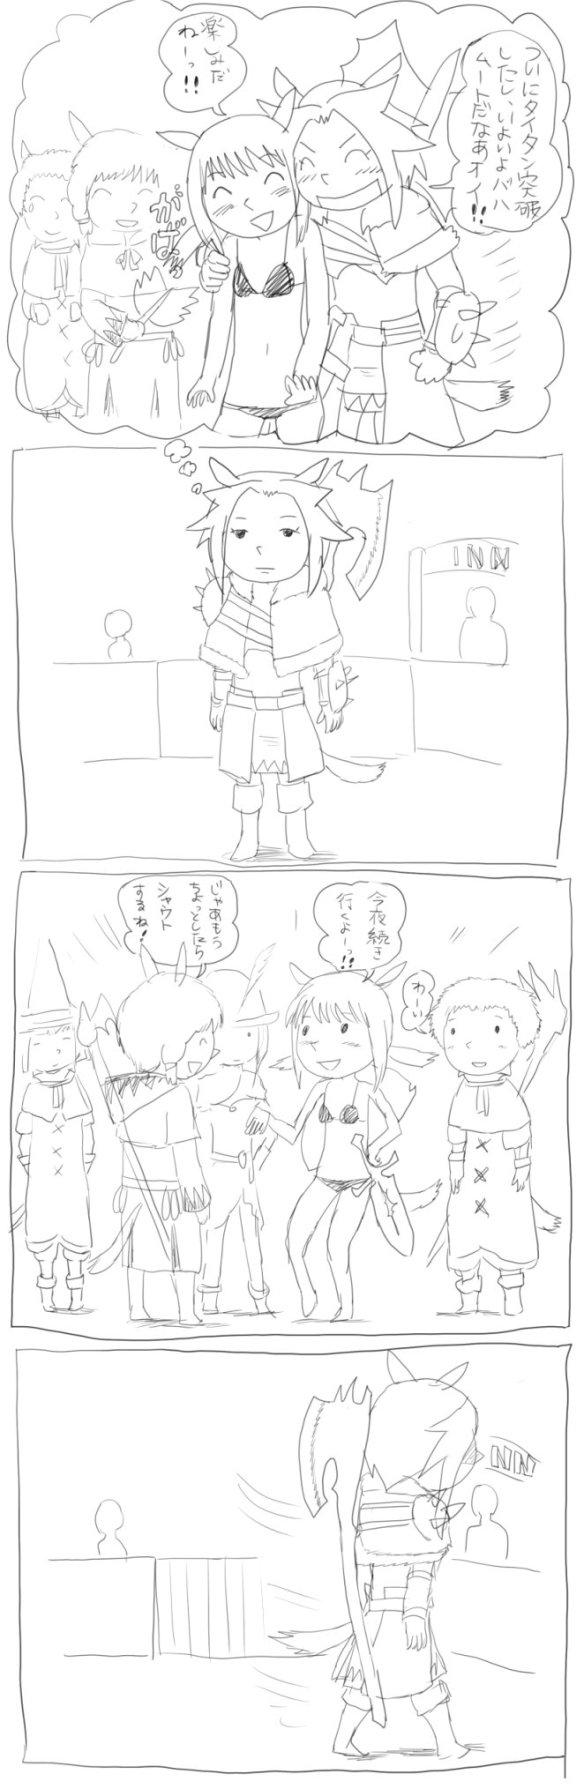 http://i0.wp.com/livedoor.blogimg.jp/daragapugapu/imgs/a/3/a35331b9.jpg?w=584